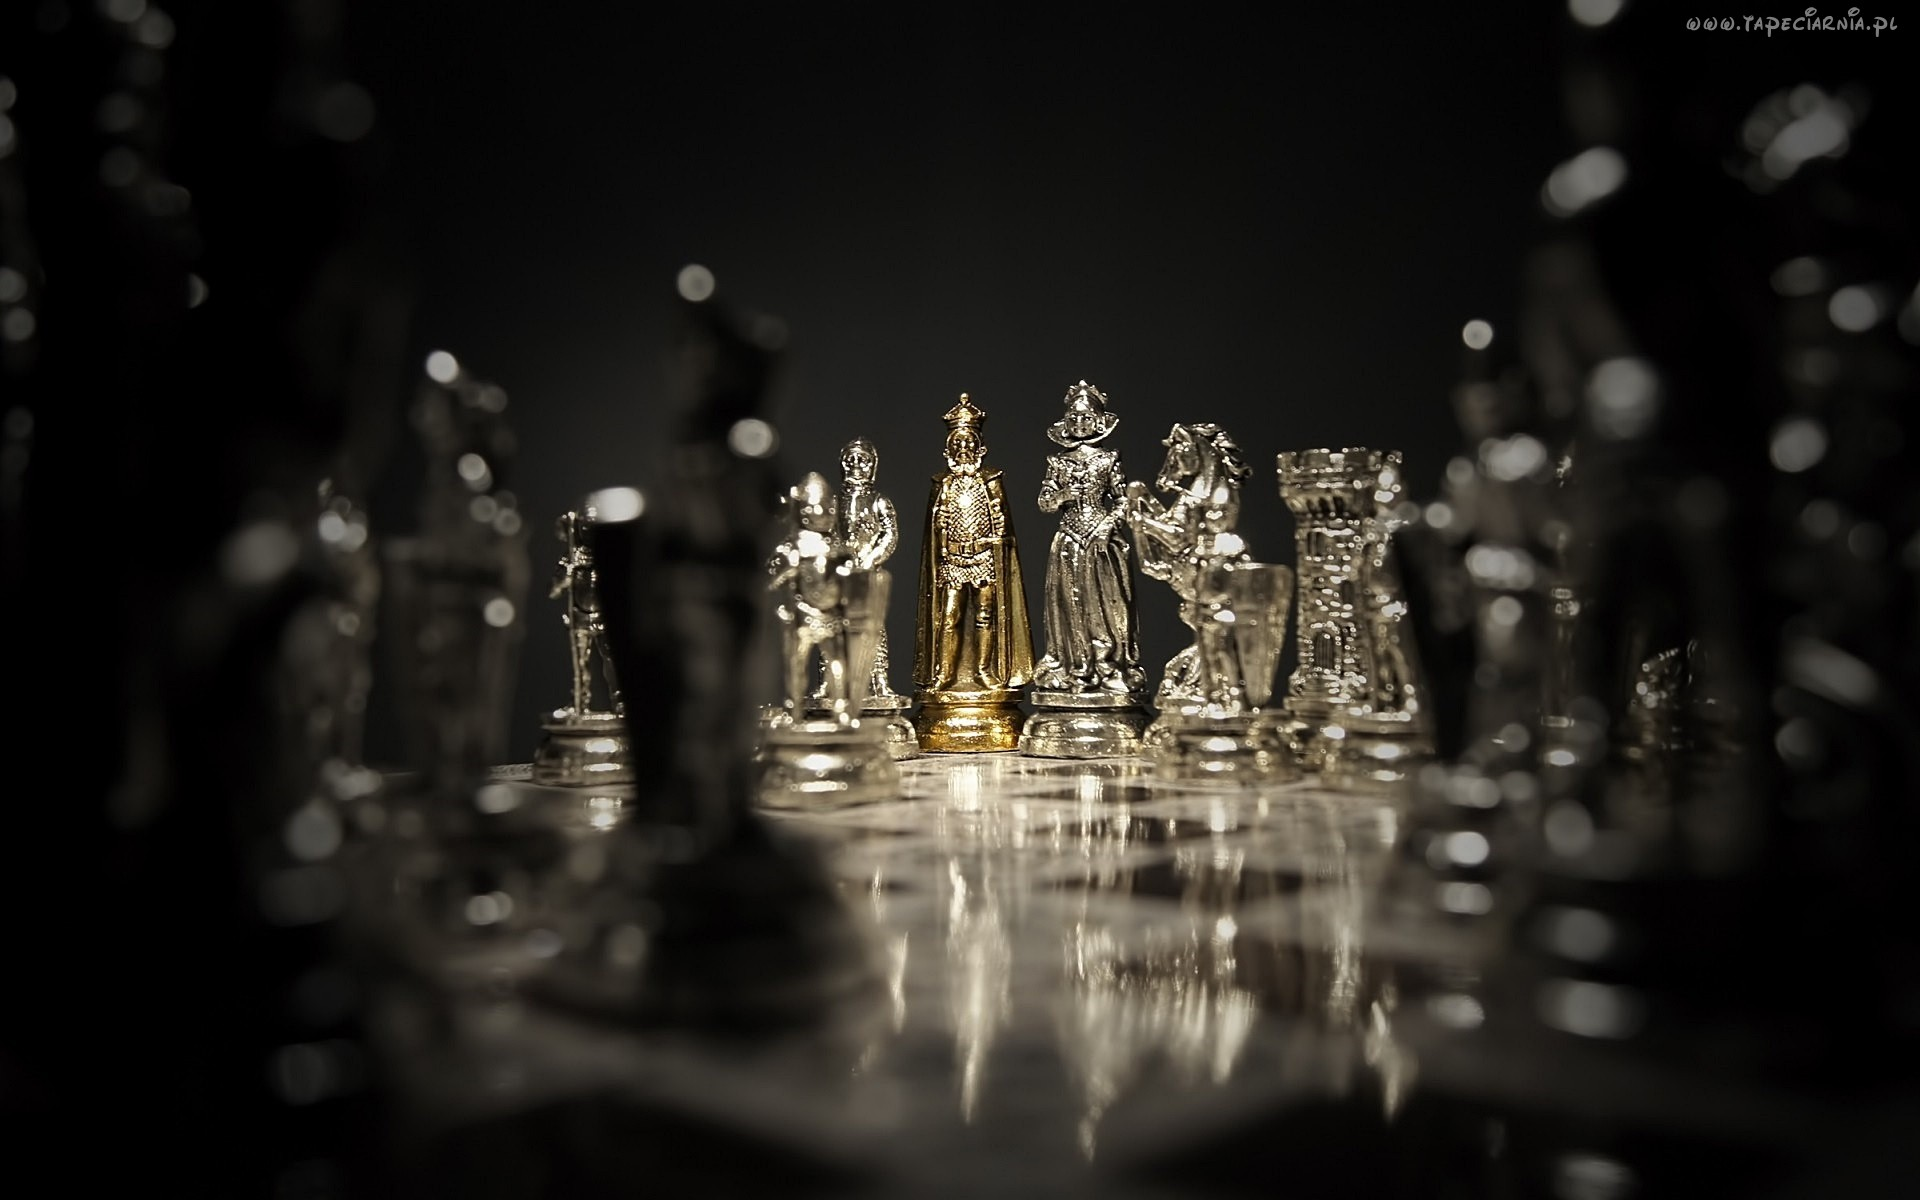 Tapeta szachowa 7